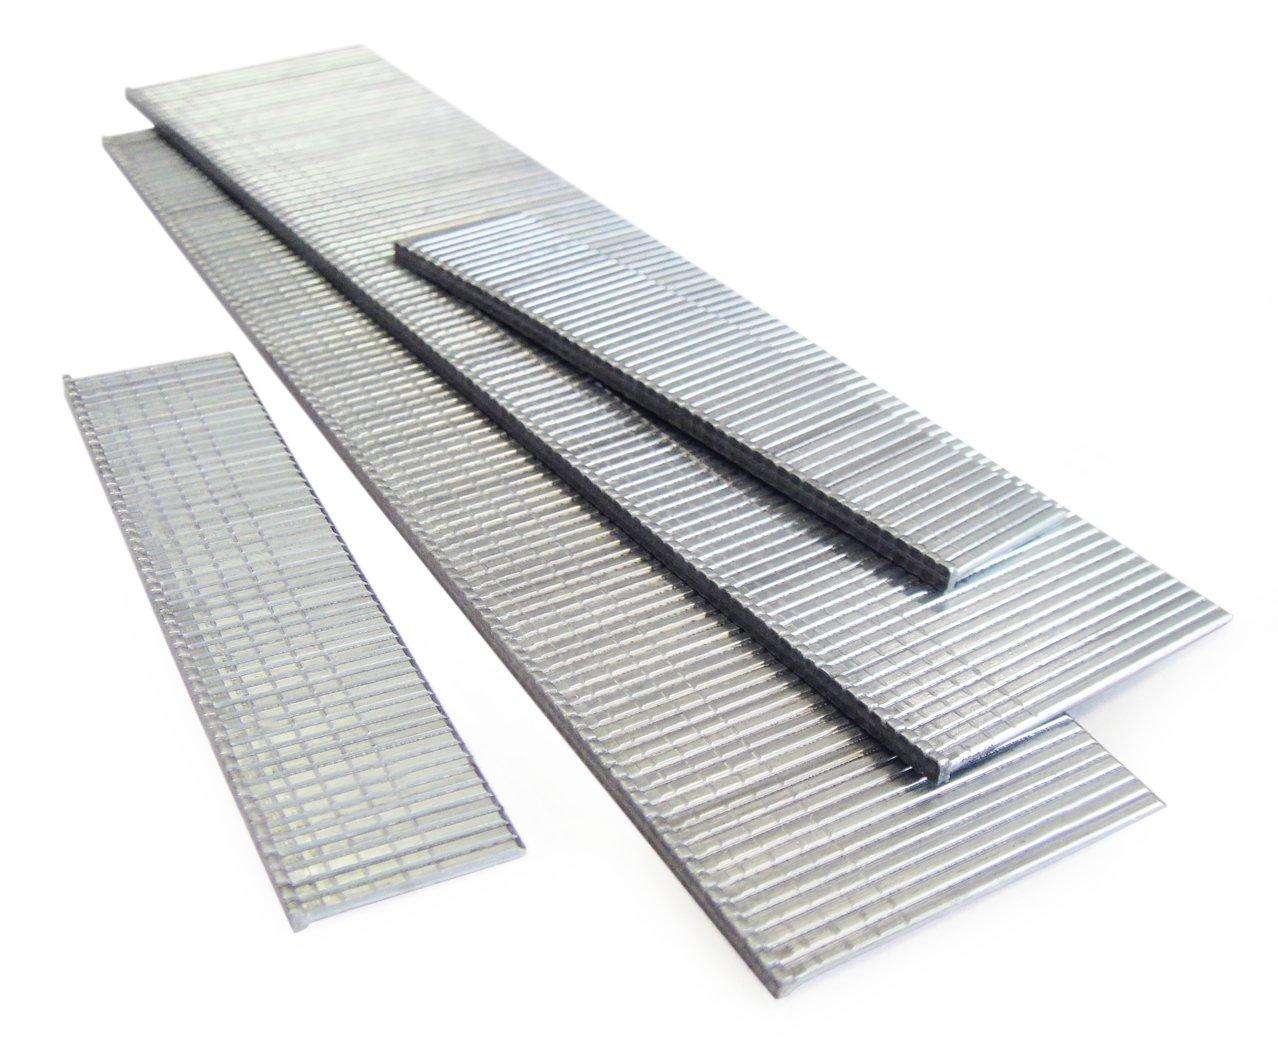 40 mm caja de 1000 unidades Set Piezas Tacwise 0747 Clavos de 180 x 40 mm